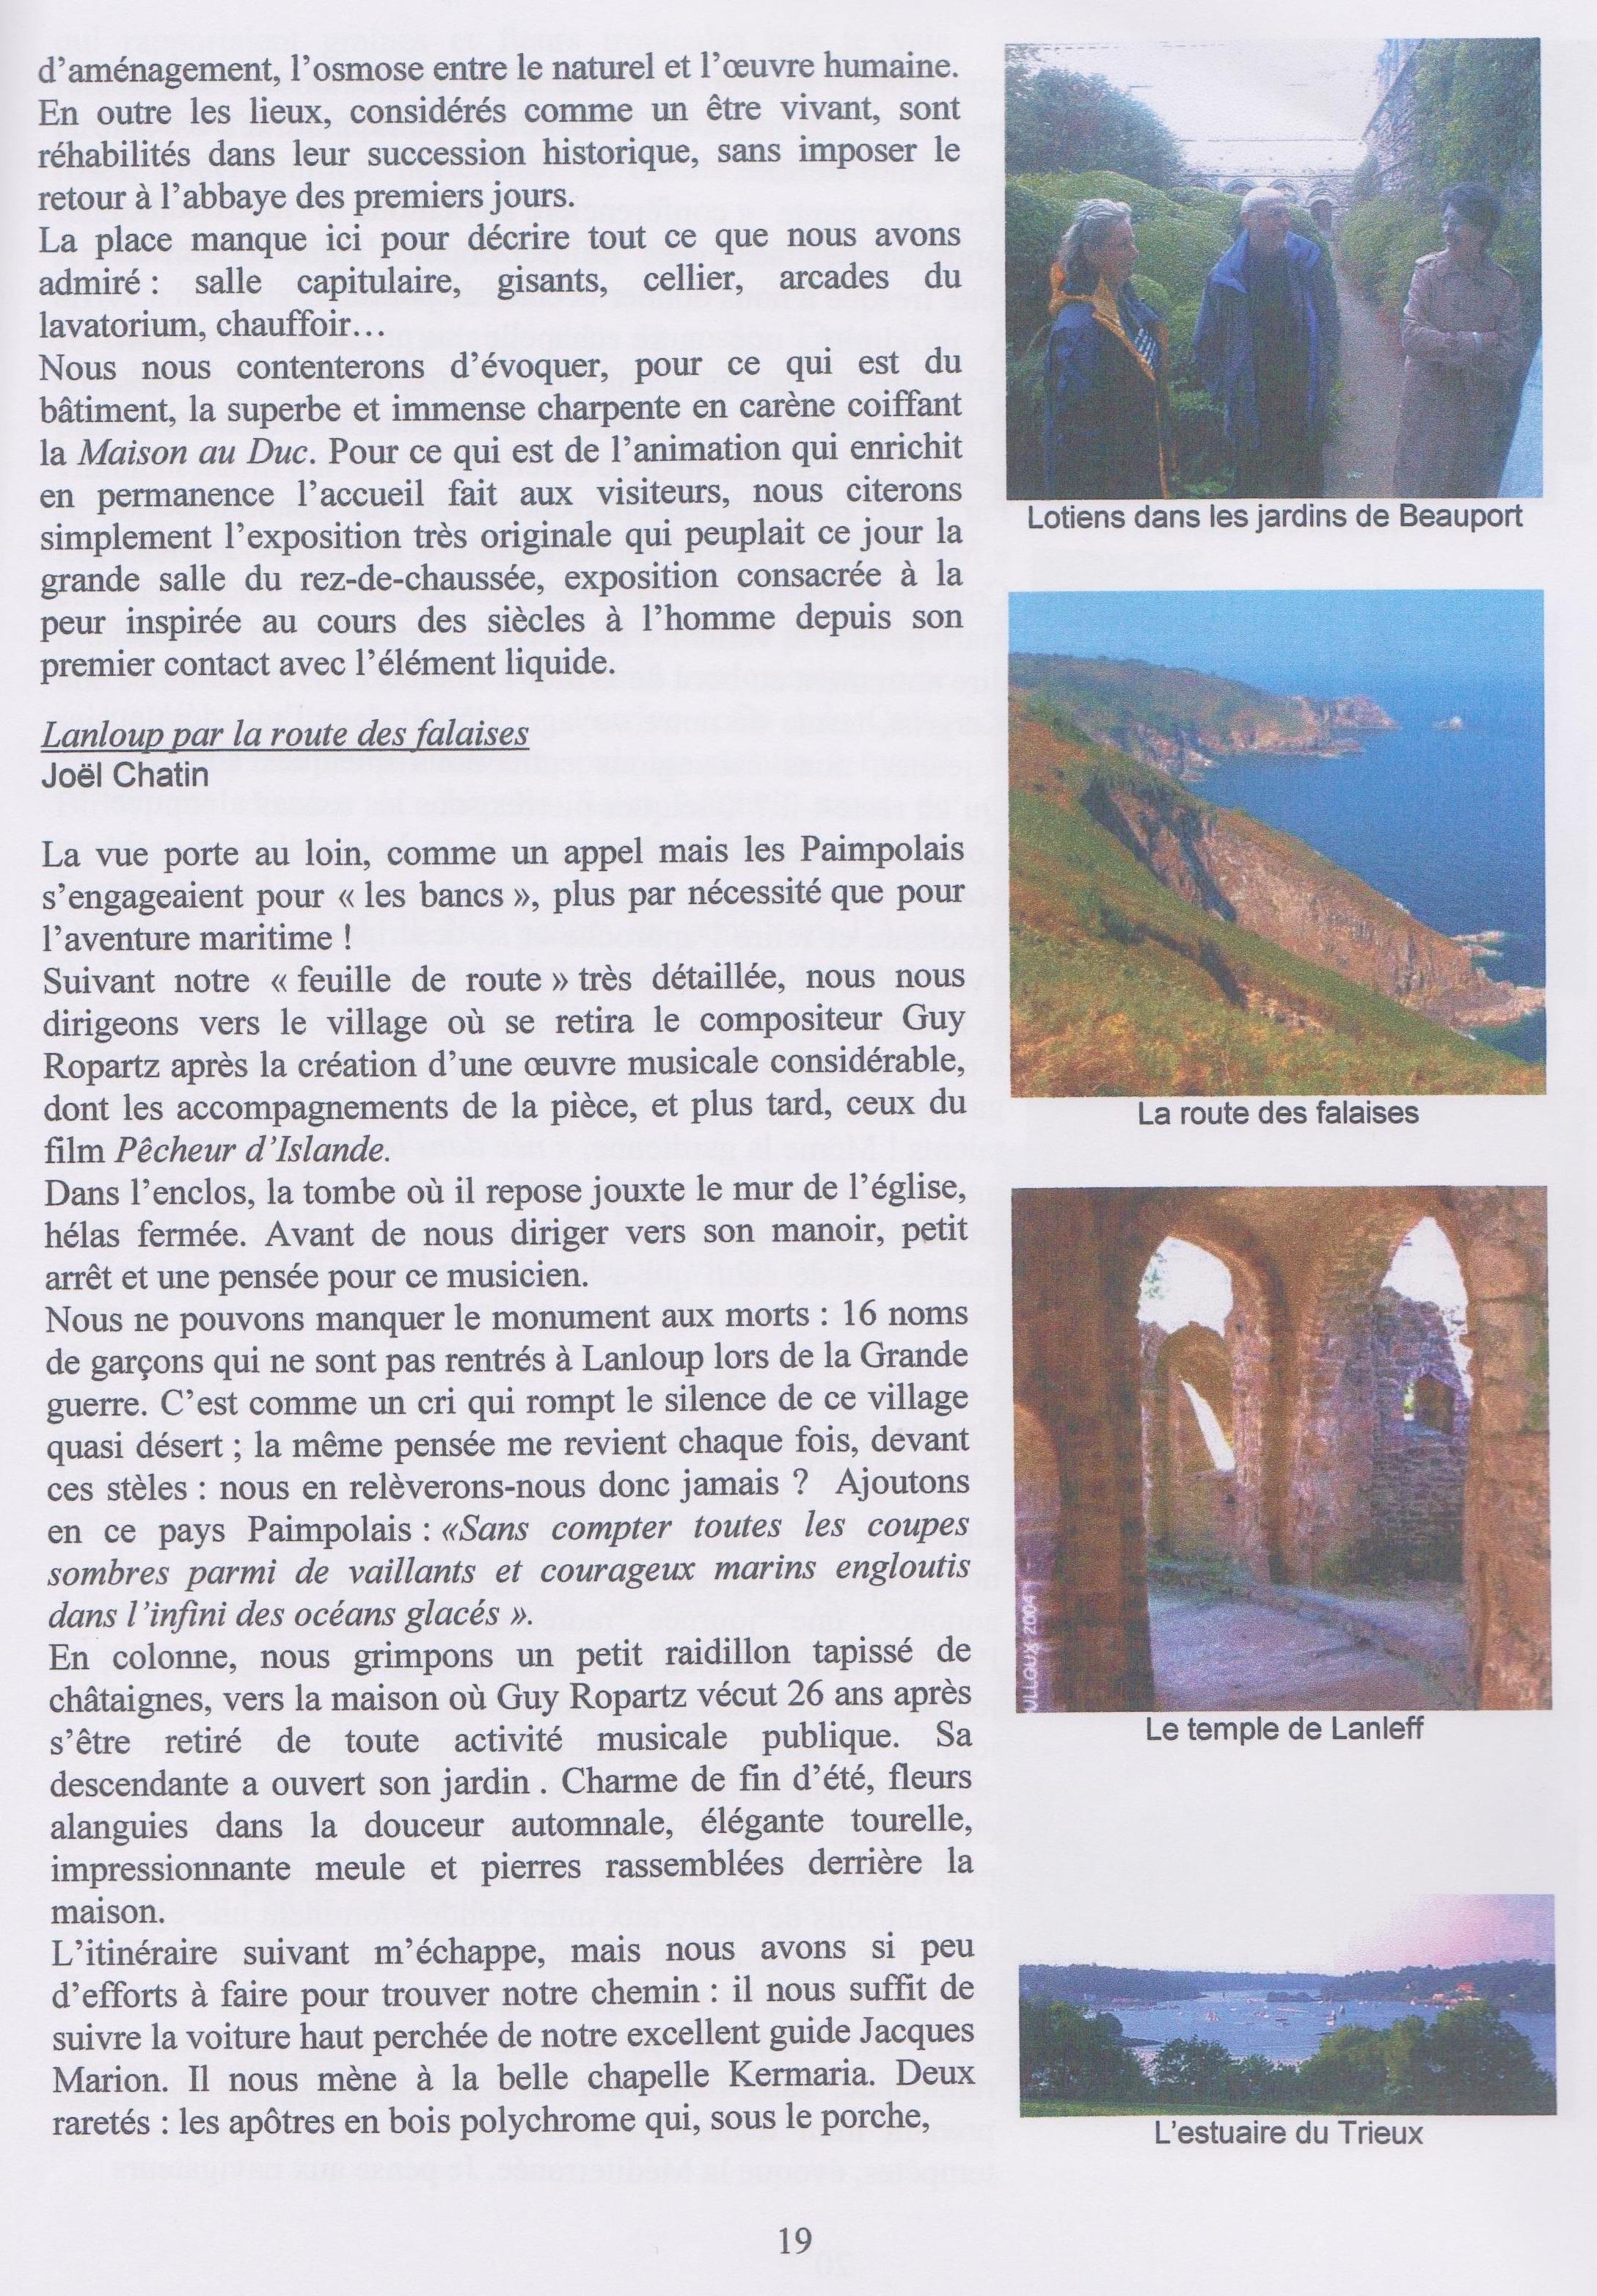 Voyage Paimpol 2006-page 19